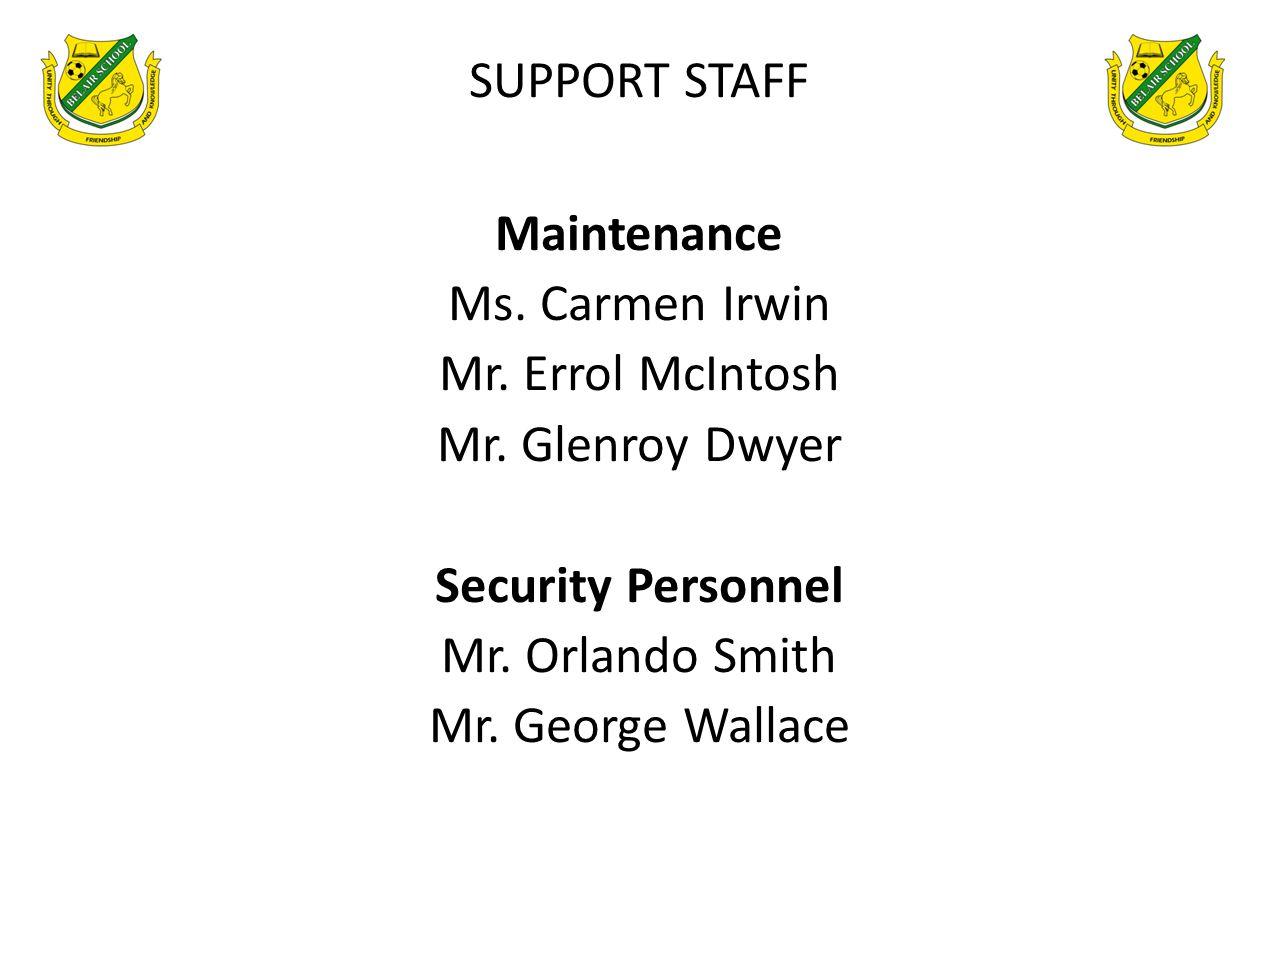 SUPPORT STAFF Maintenance. Ms. Carmen Irwin. Mr. Errol McIntosh. Mr. Glenroy Dwyer. Security Personnel.